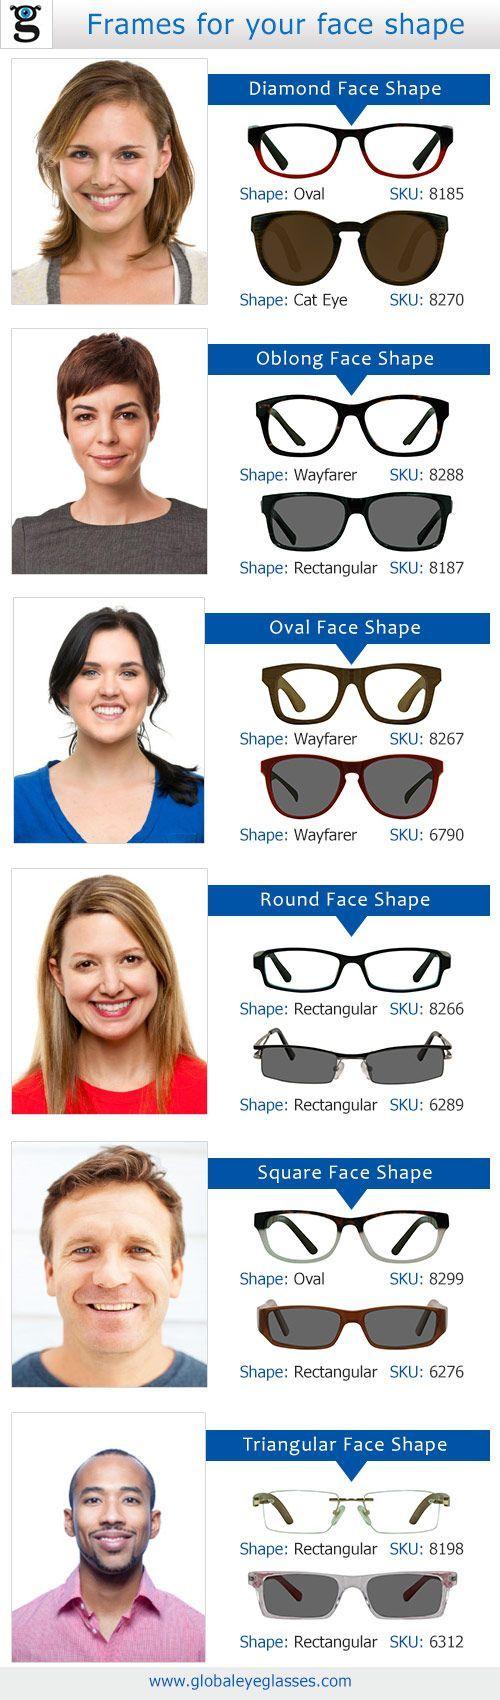 Choosing the right eyeglasses based on your  faceshape. Infographic for Eyeglasses